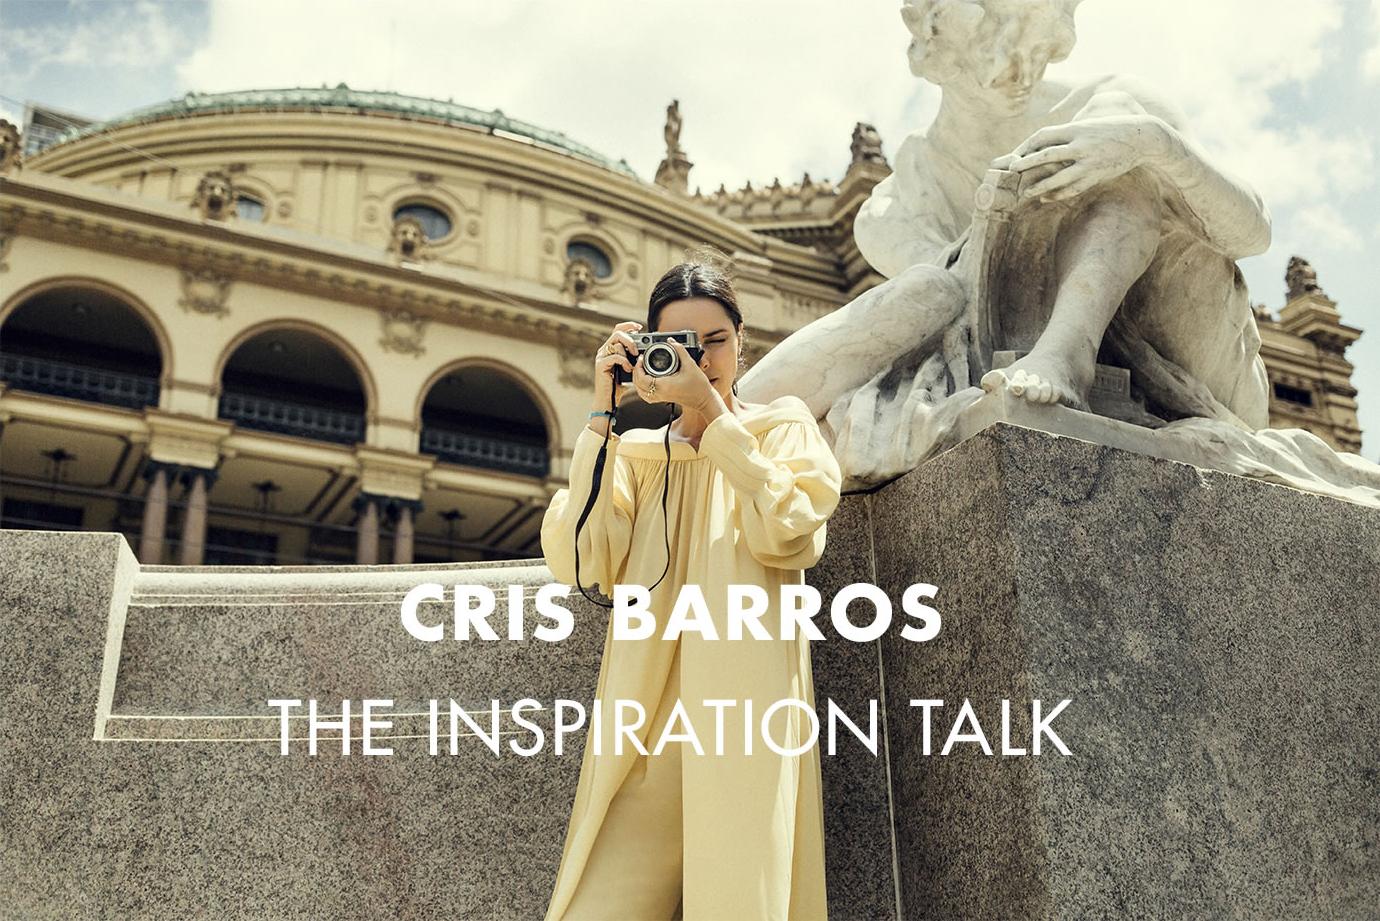 7c0eaf25ac0ed Cris Barros - Oui 1